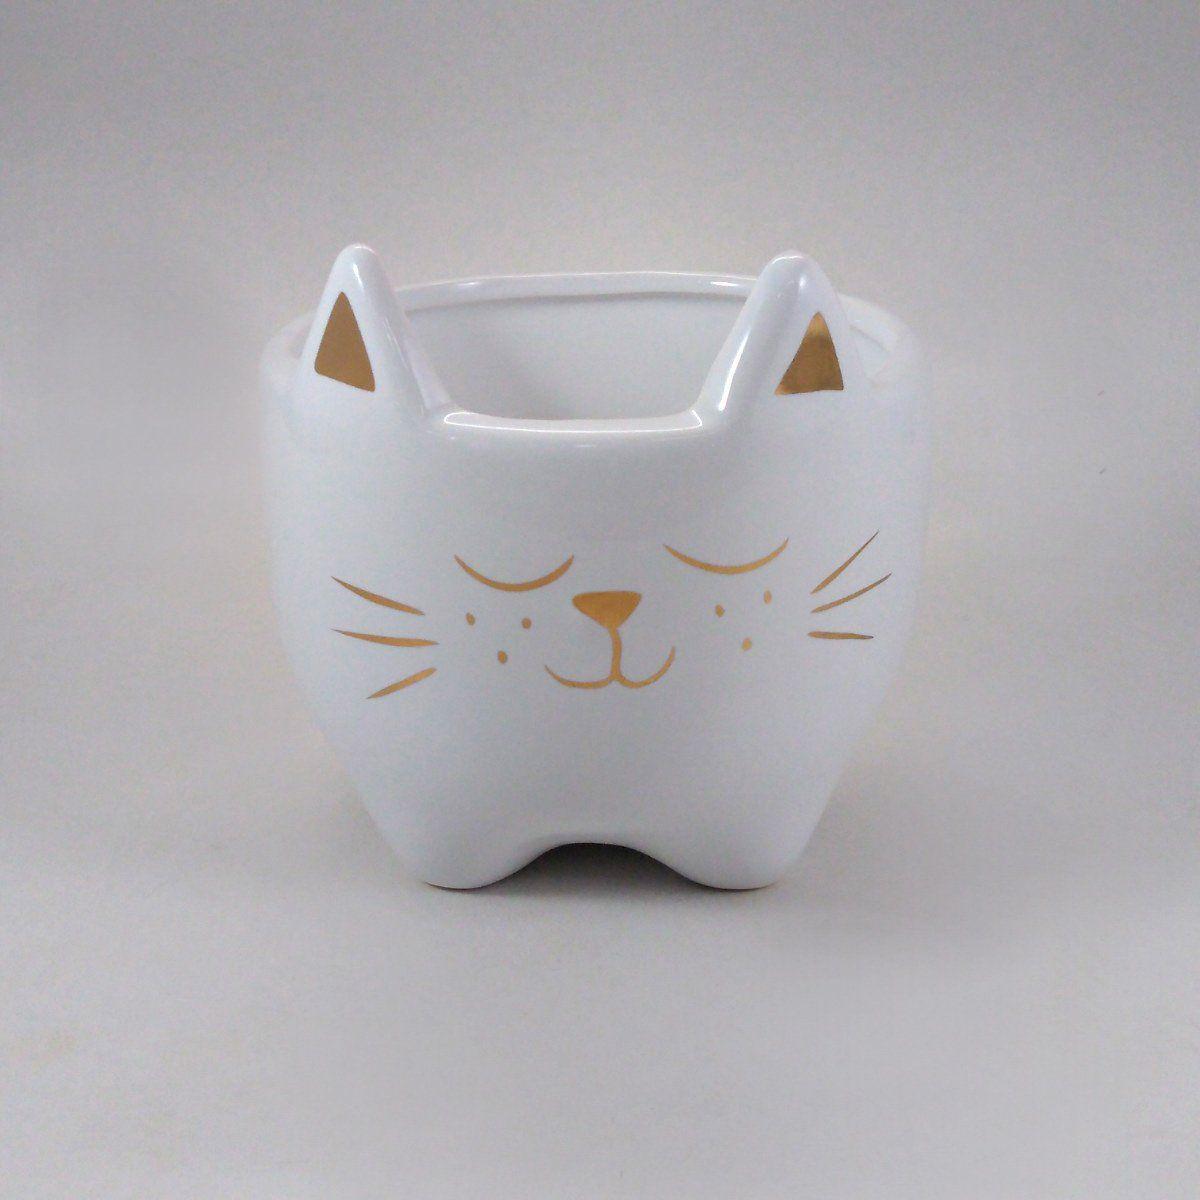 Cachepot Gato Cerâmica Decorativo Branco 13x10CM 8701